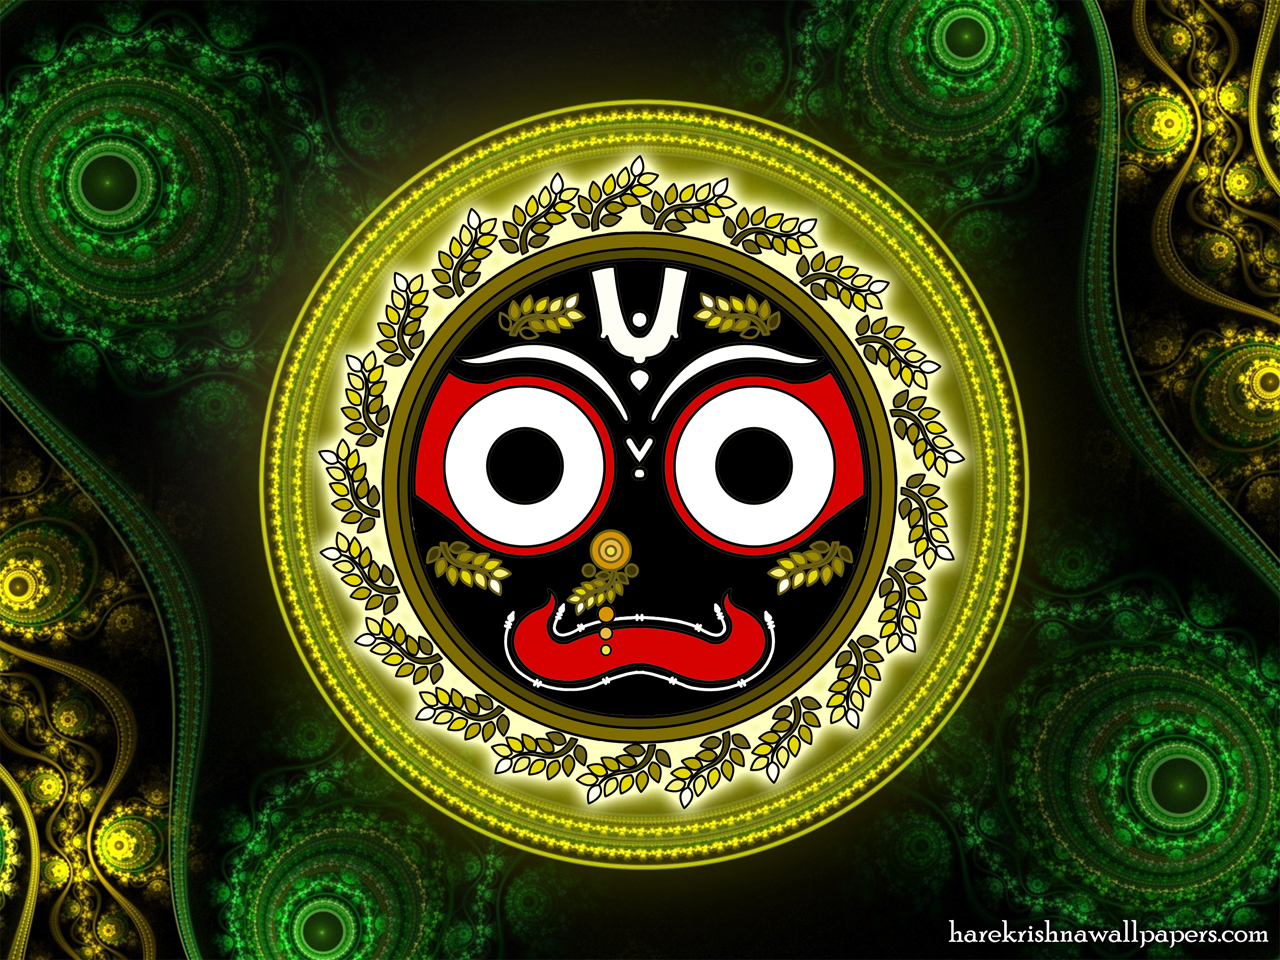 Jai Jagannath Wallpaper (014) Size 1280x960 Download